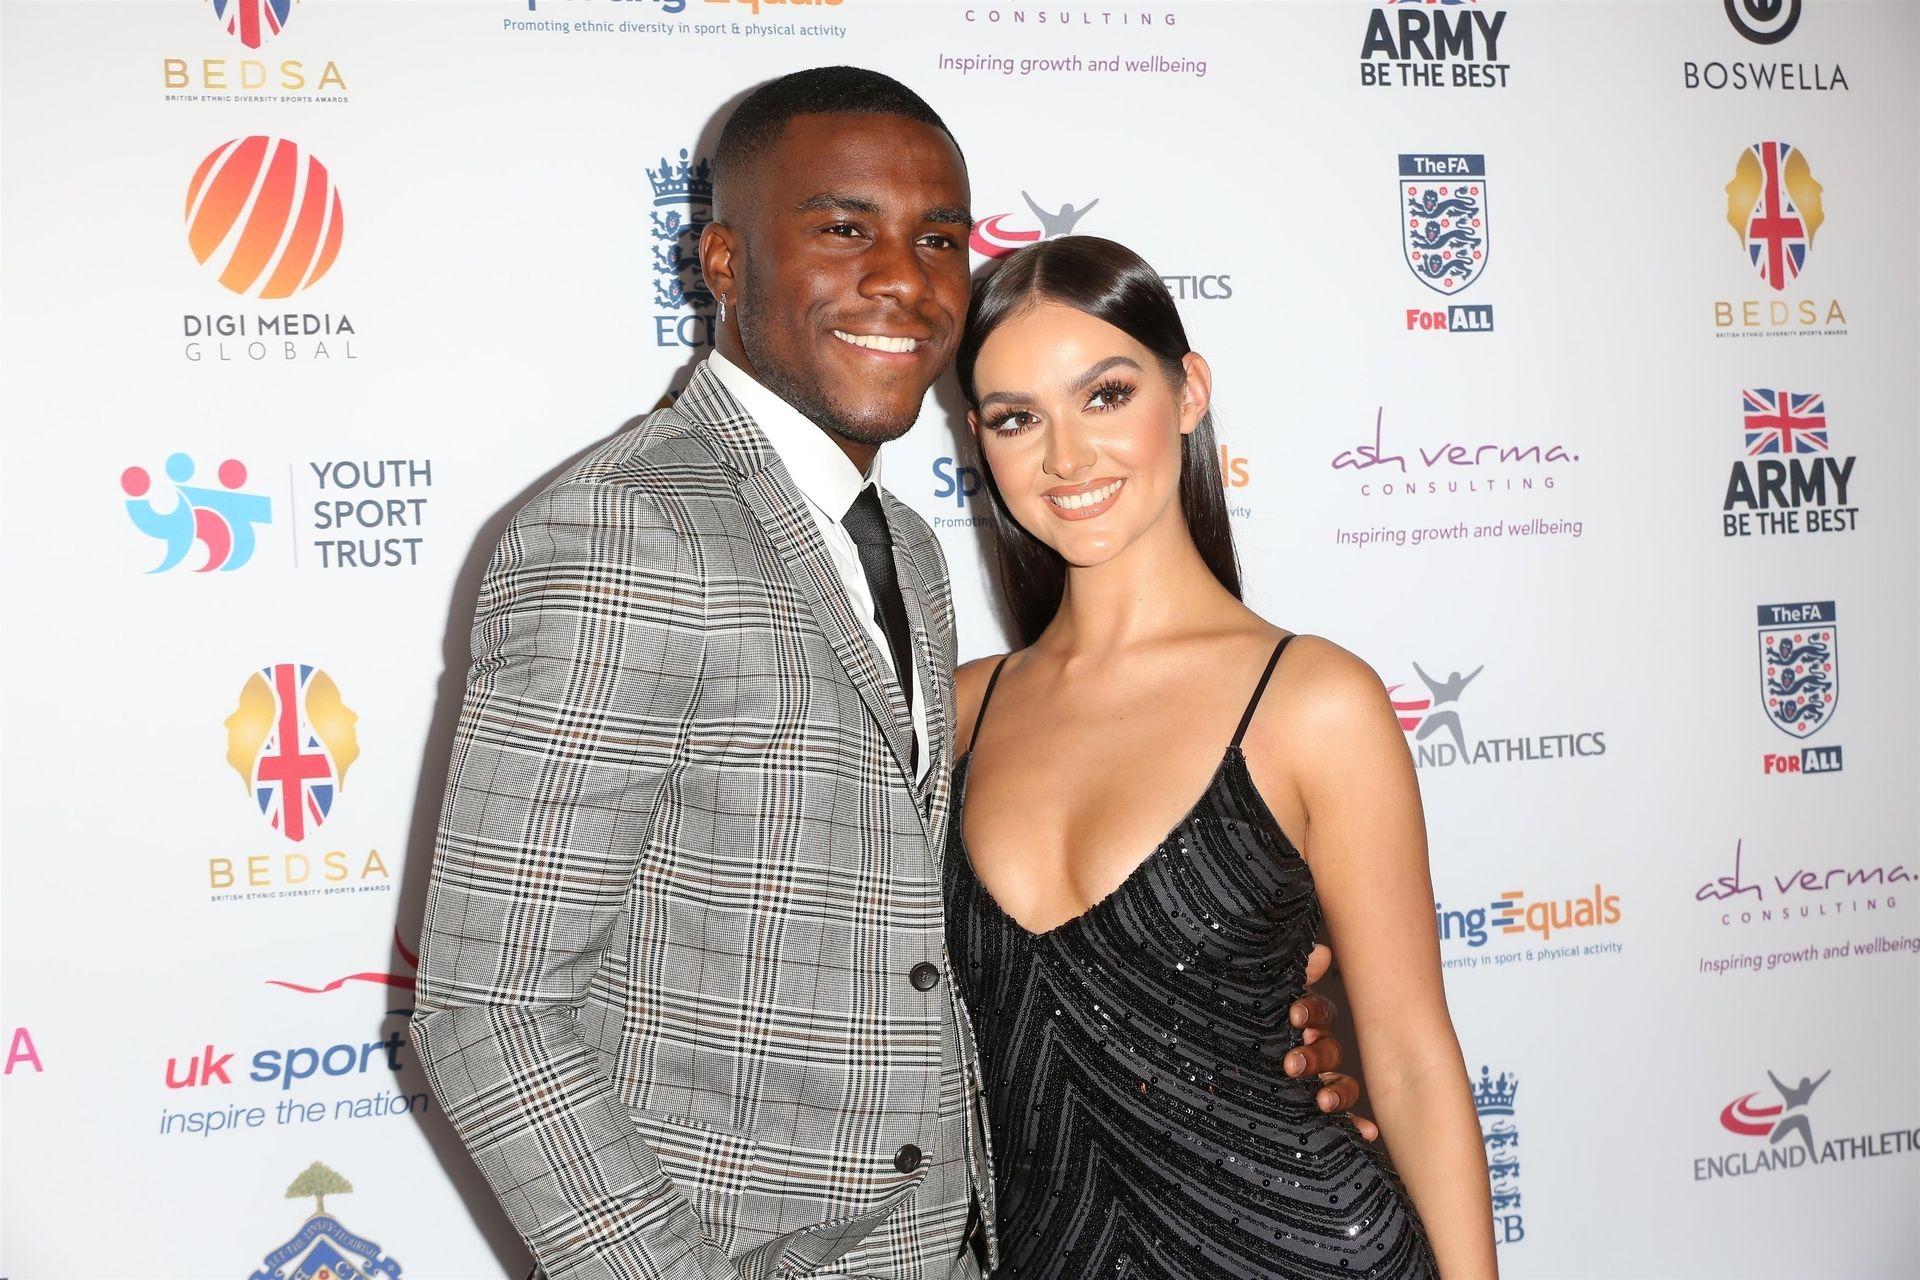 Siannise Fudge & Luke Trotman Are Seen At British Ethnic Diversity Sports Awards 0045